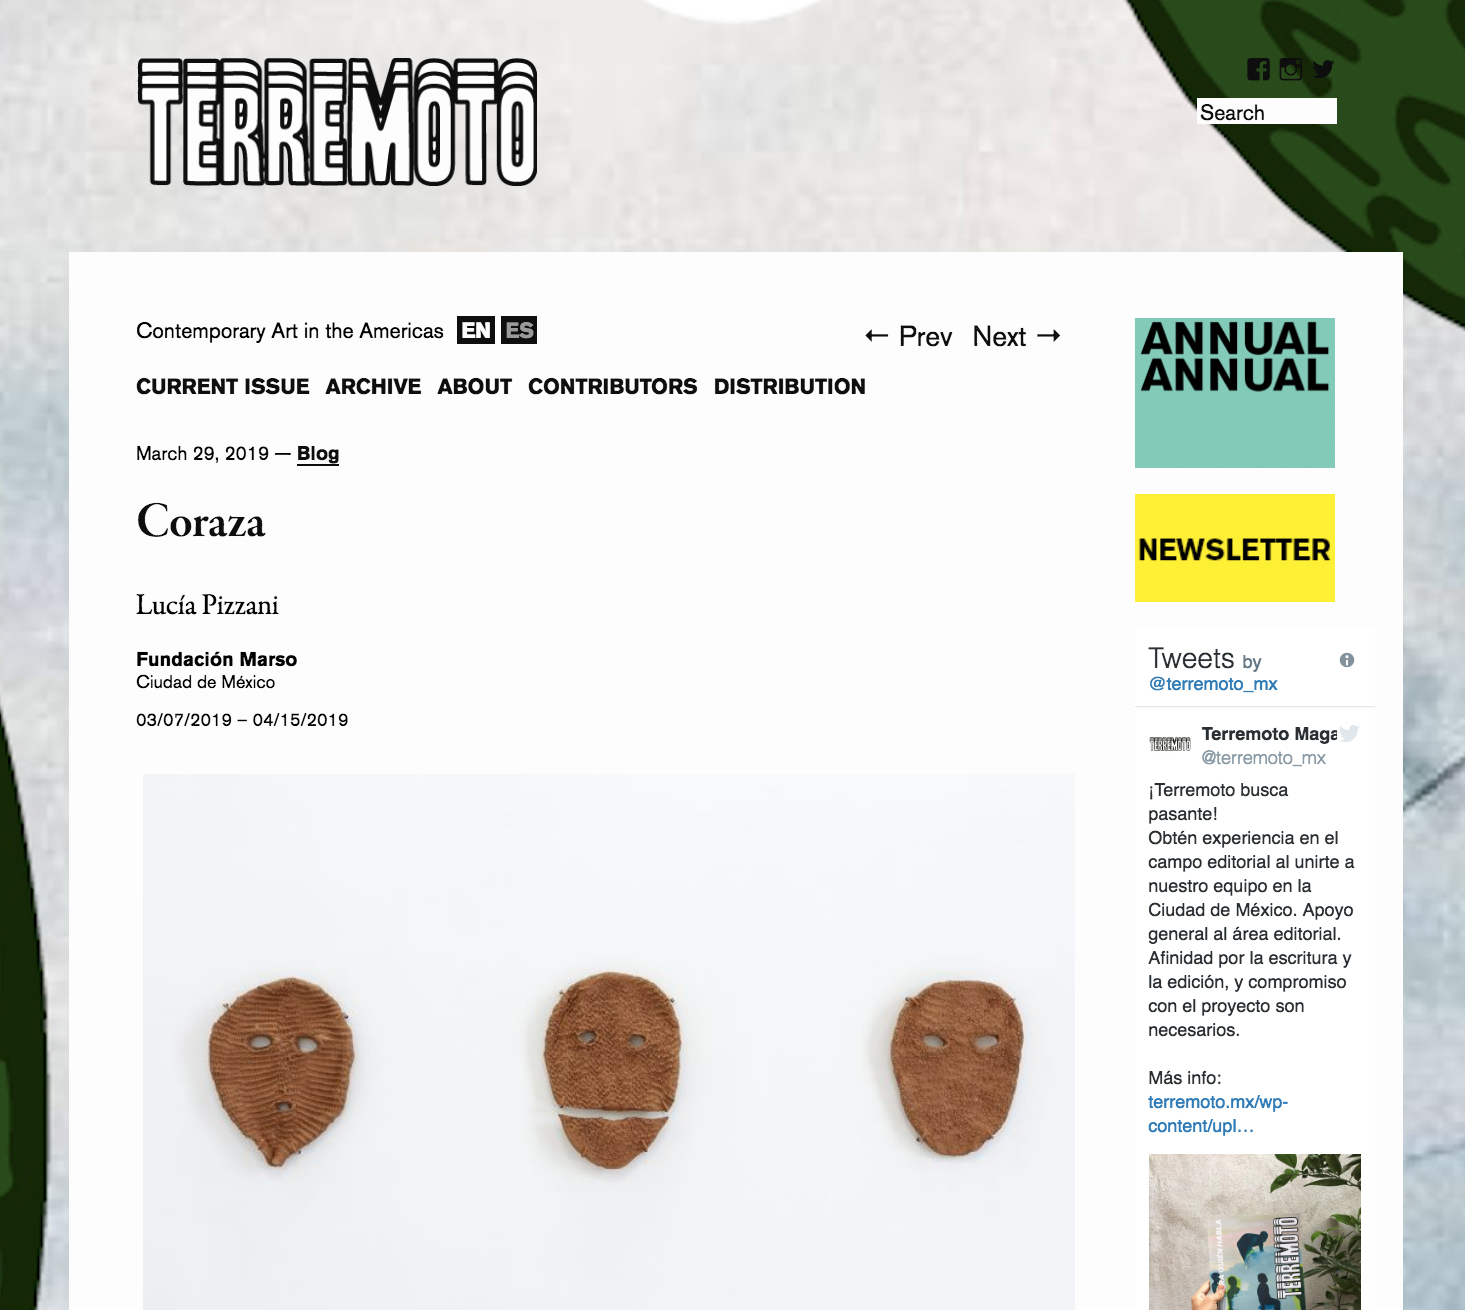 Terremoto-Coraza.jpg